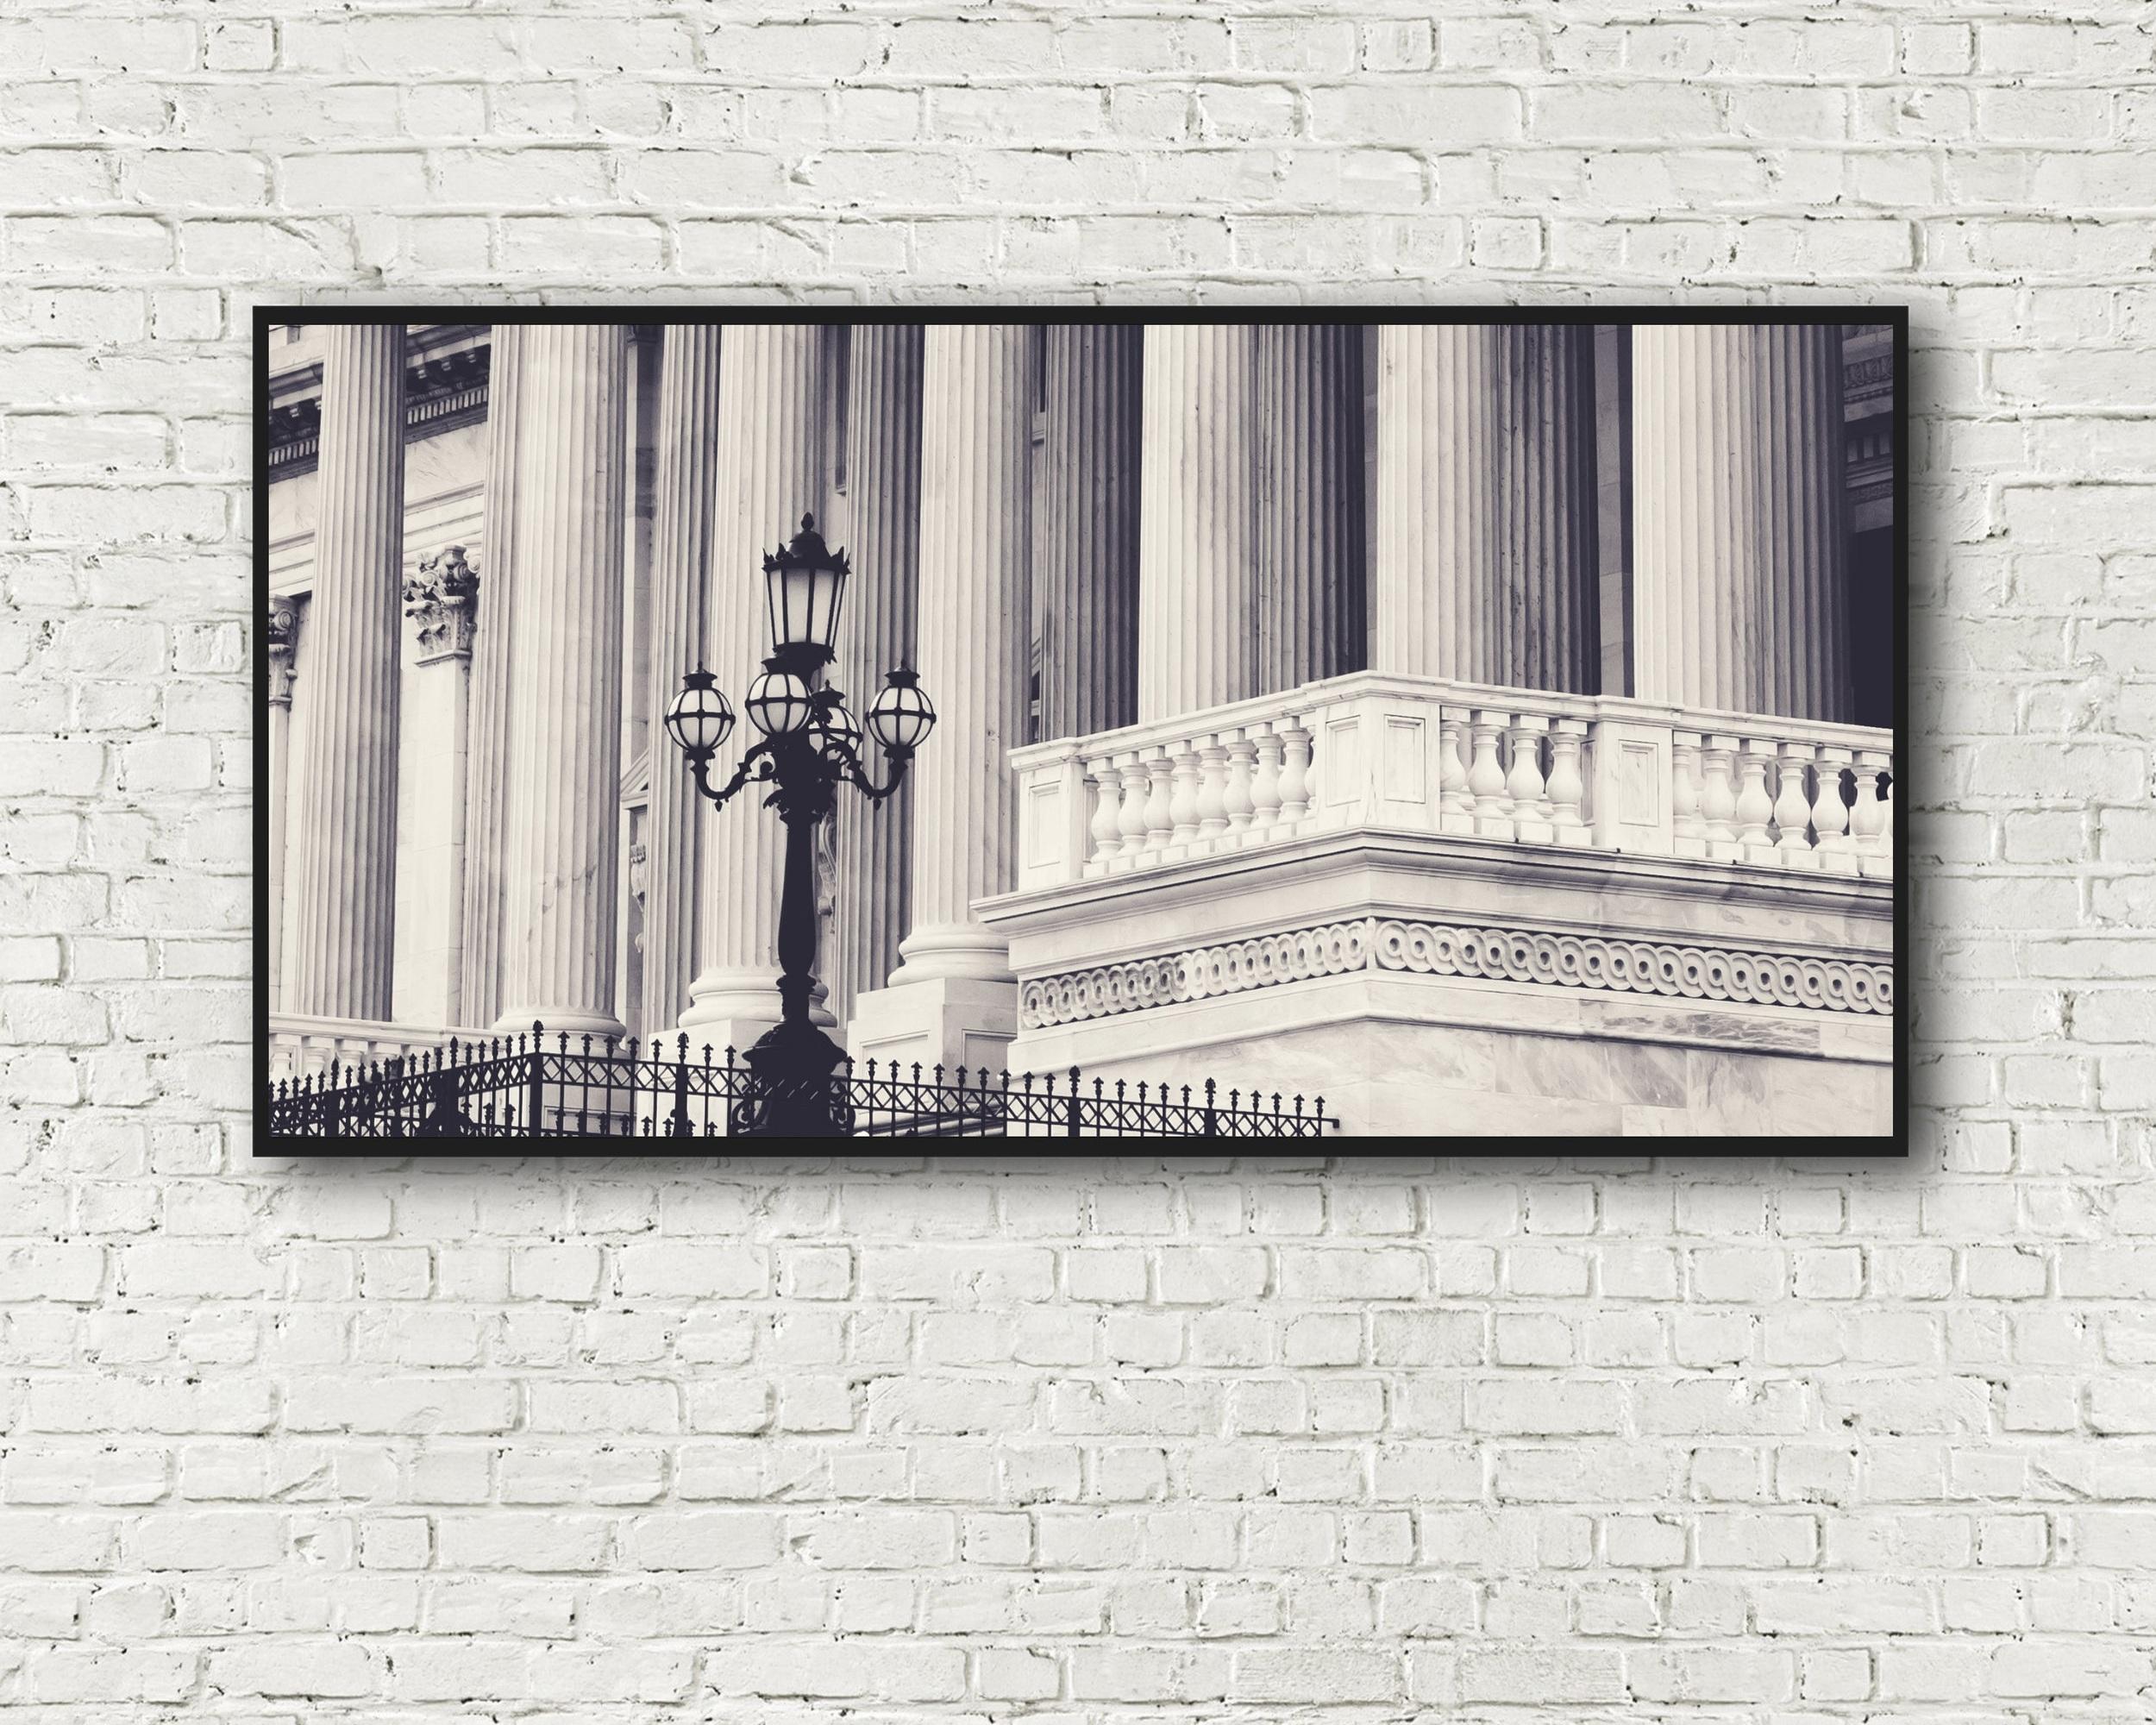 *Capitol Building Pillars White Brick Sample.jpg